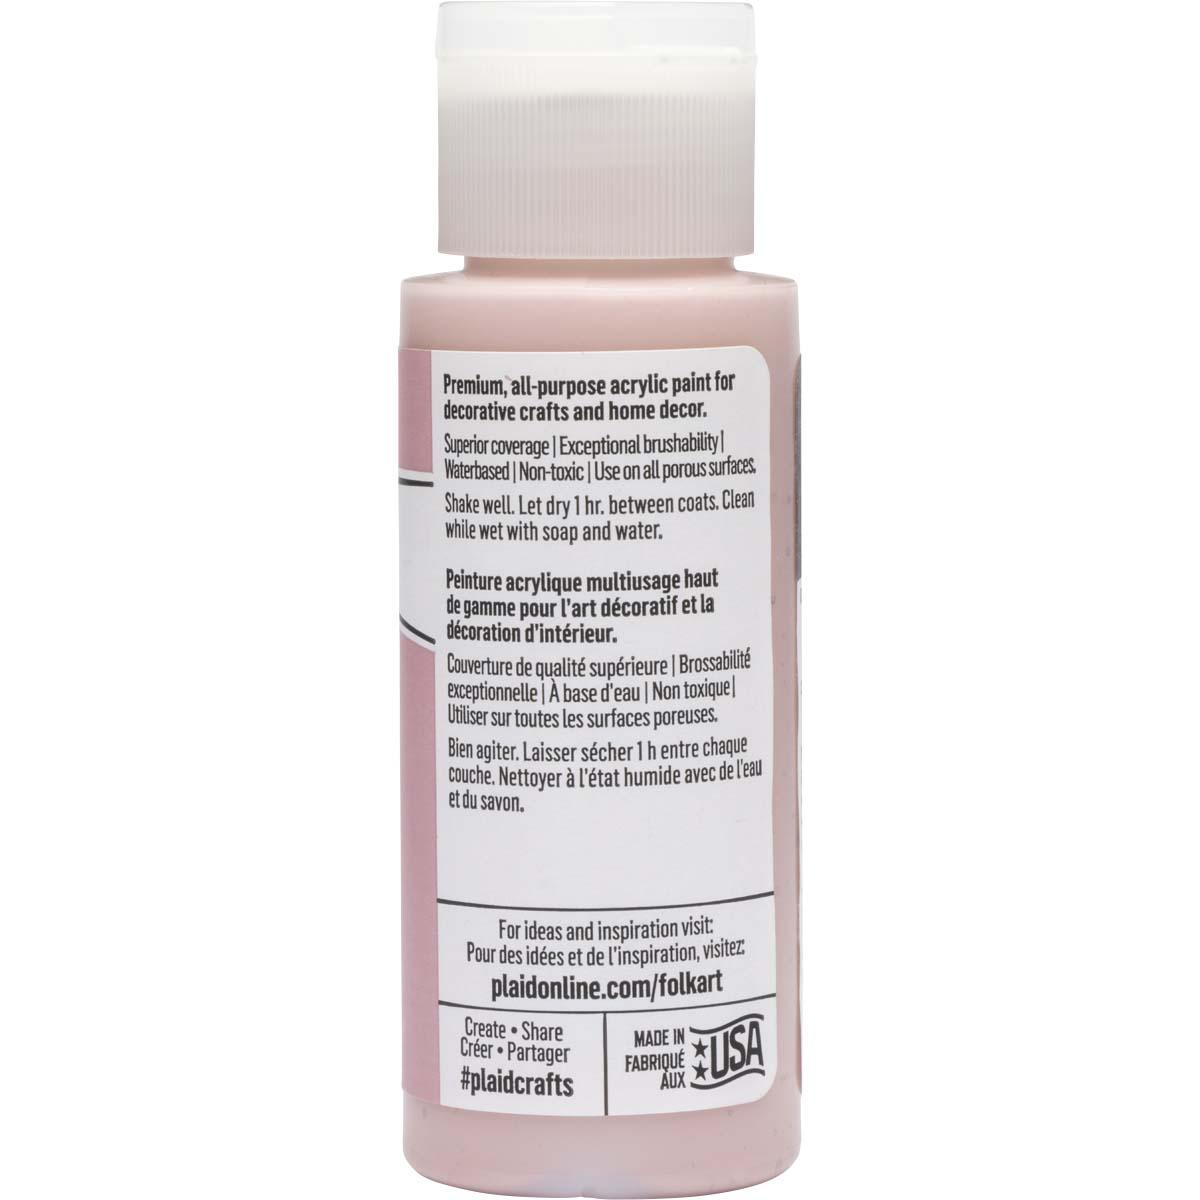 FolkArt ® Acrylic Colors - Cottage Rose, 2 oz. - 11930